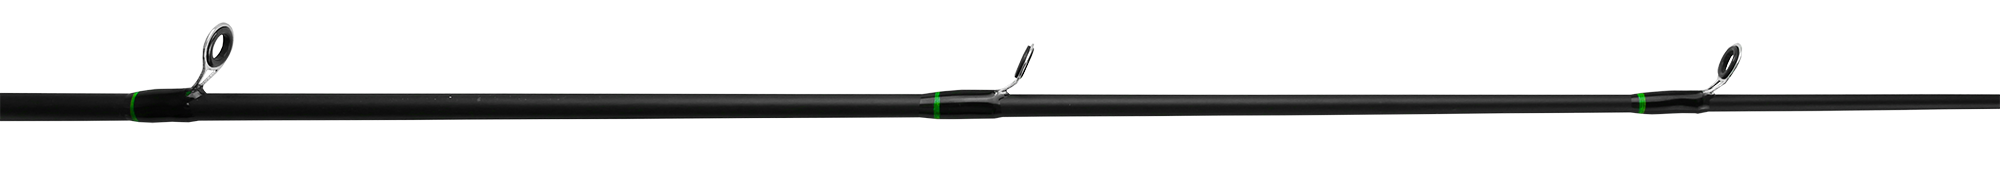 Vara Para Carretilha Albatroz Comander Carbon Solid C Vl 6